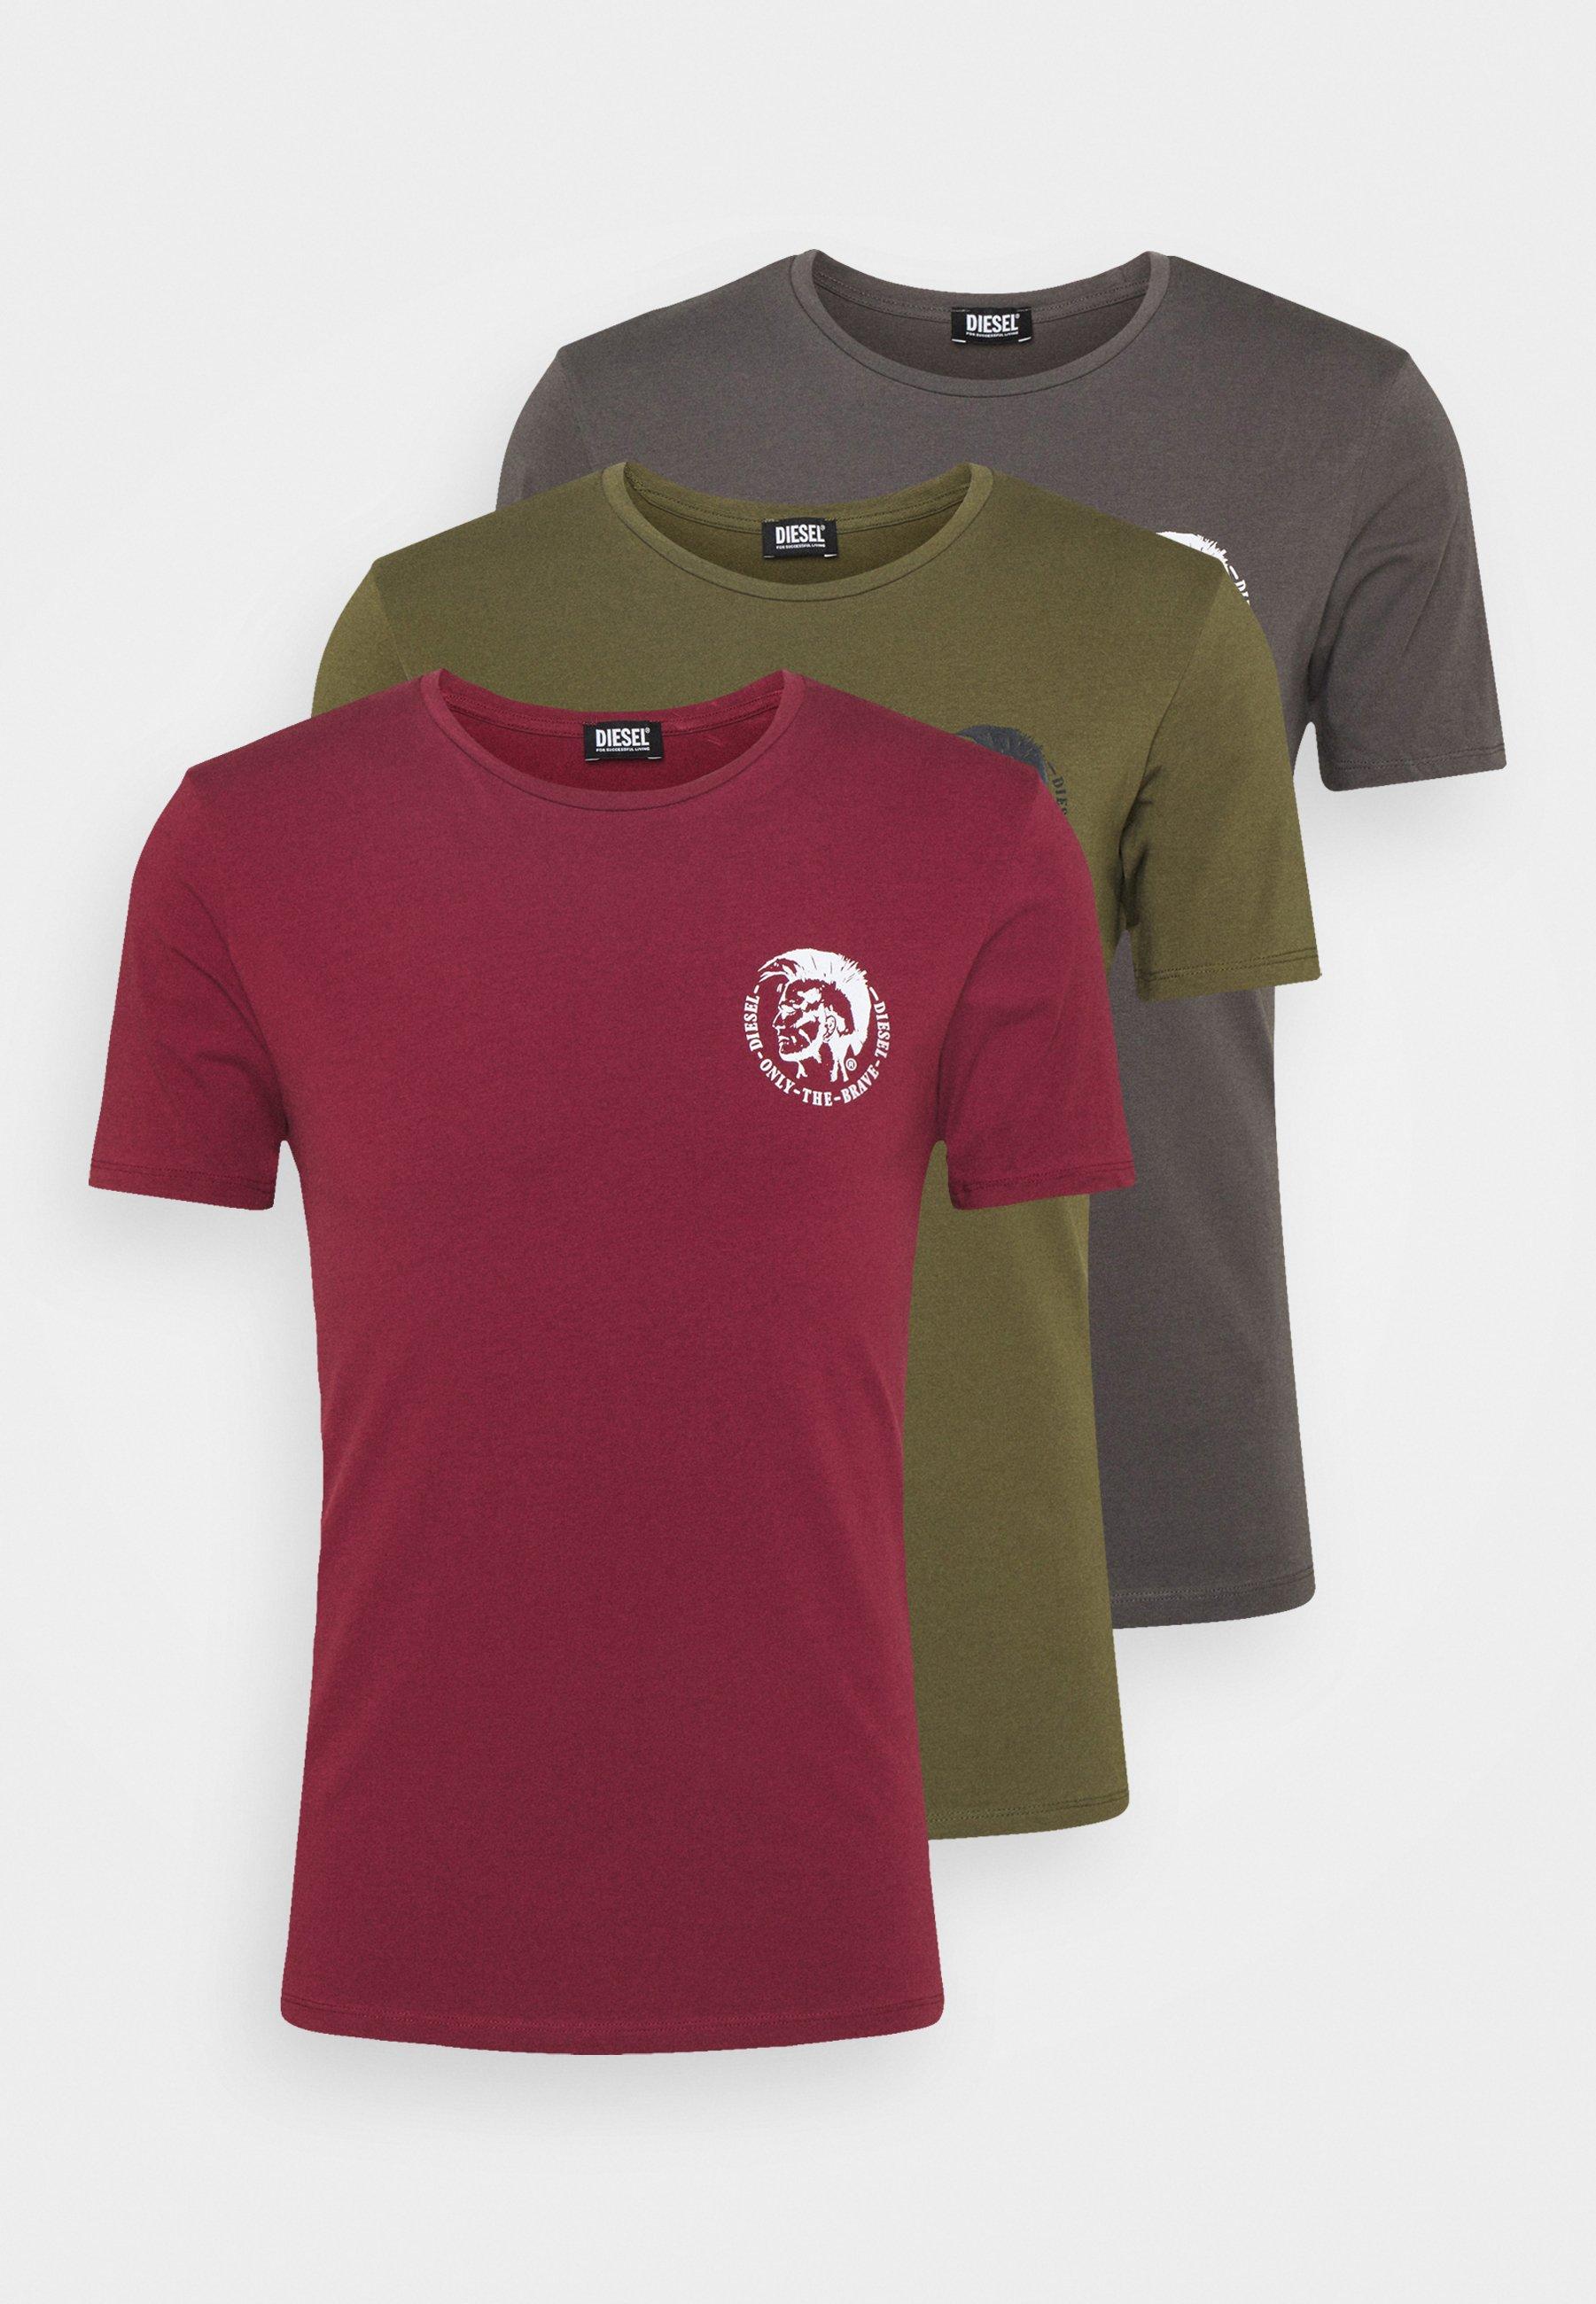 Homme UMTEE RANDAL 3 PACK - T-shirt basique